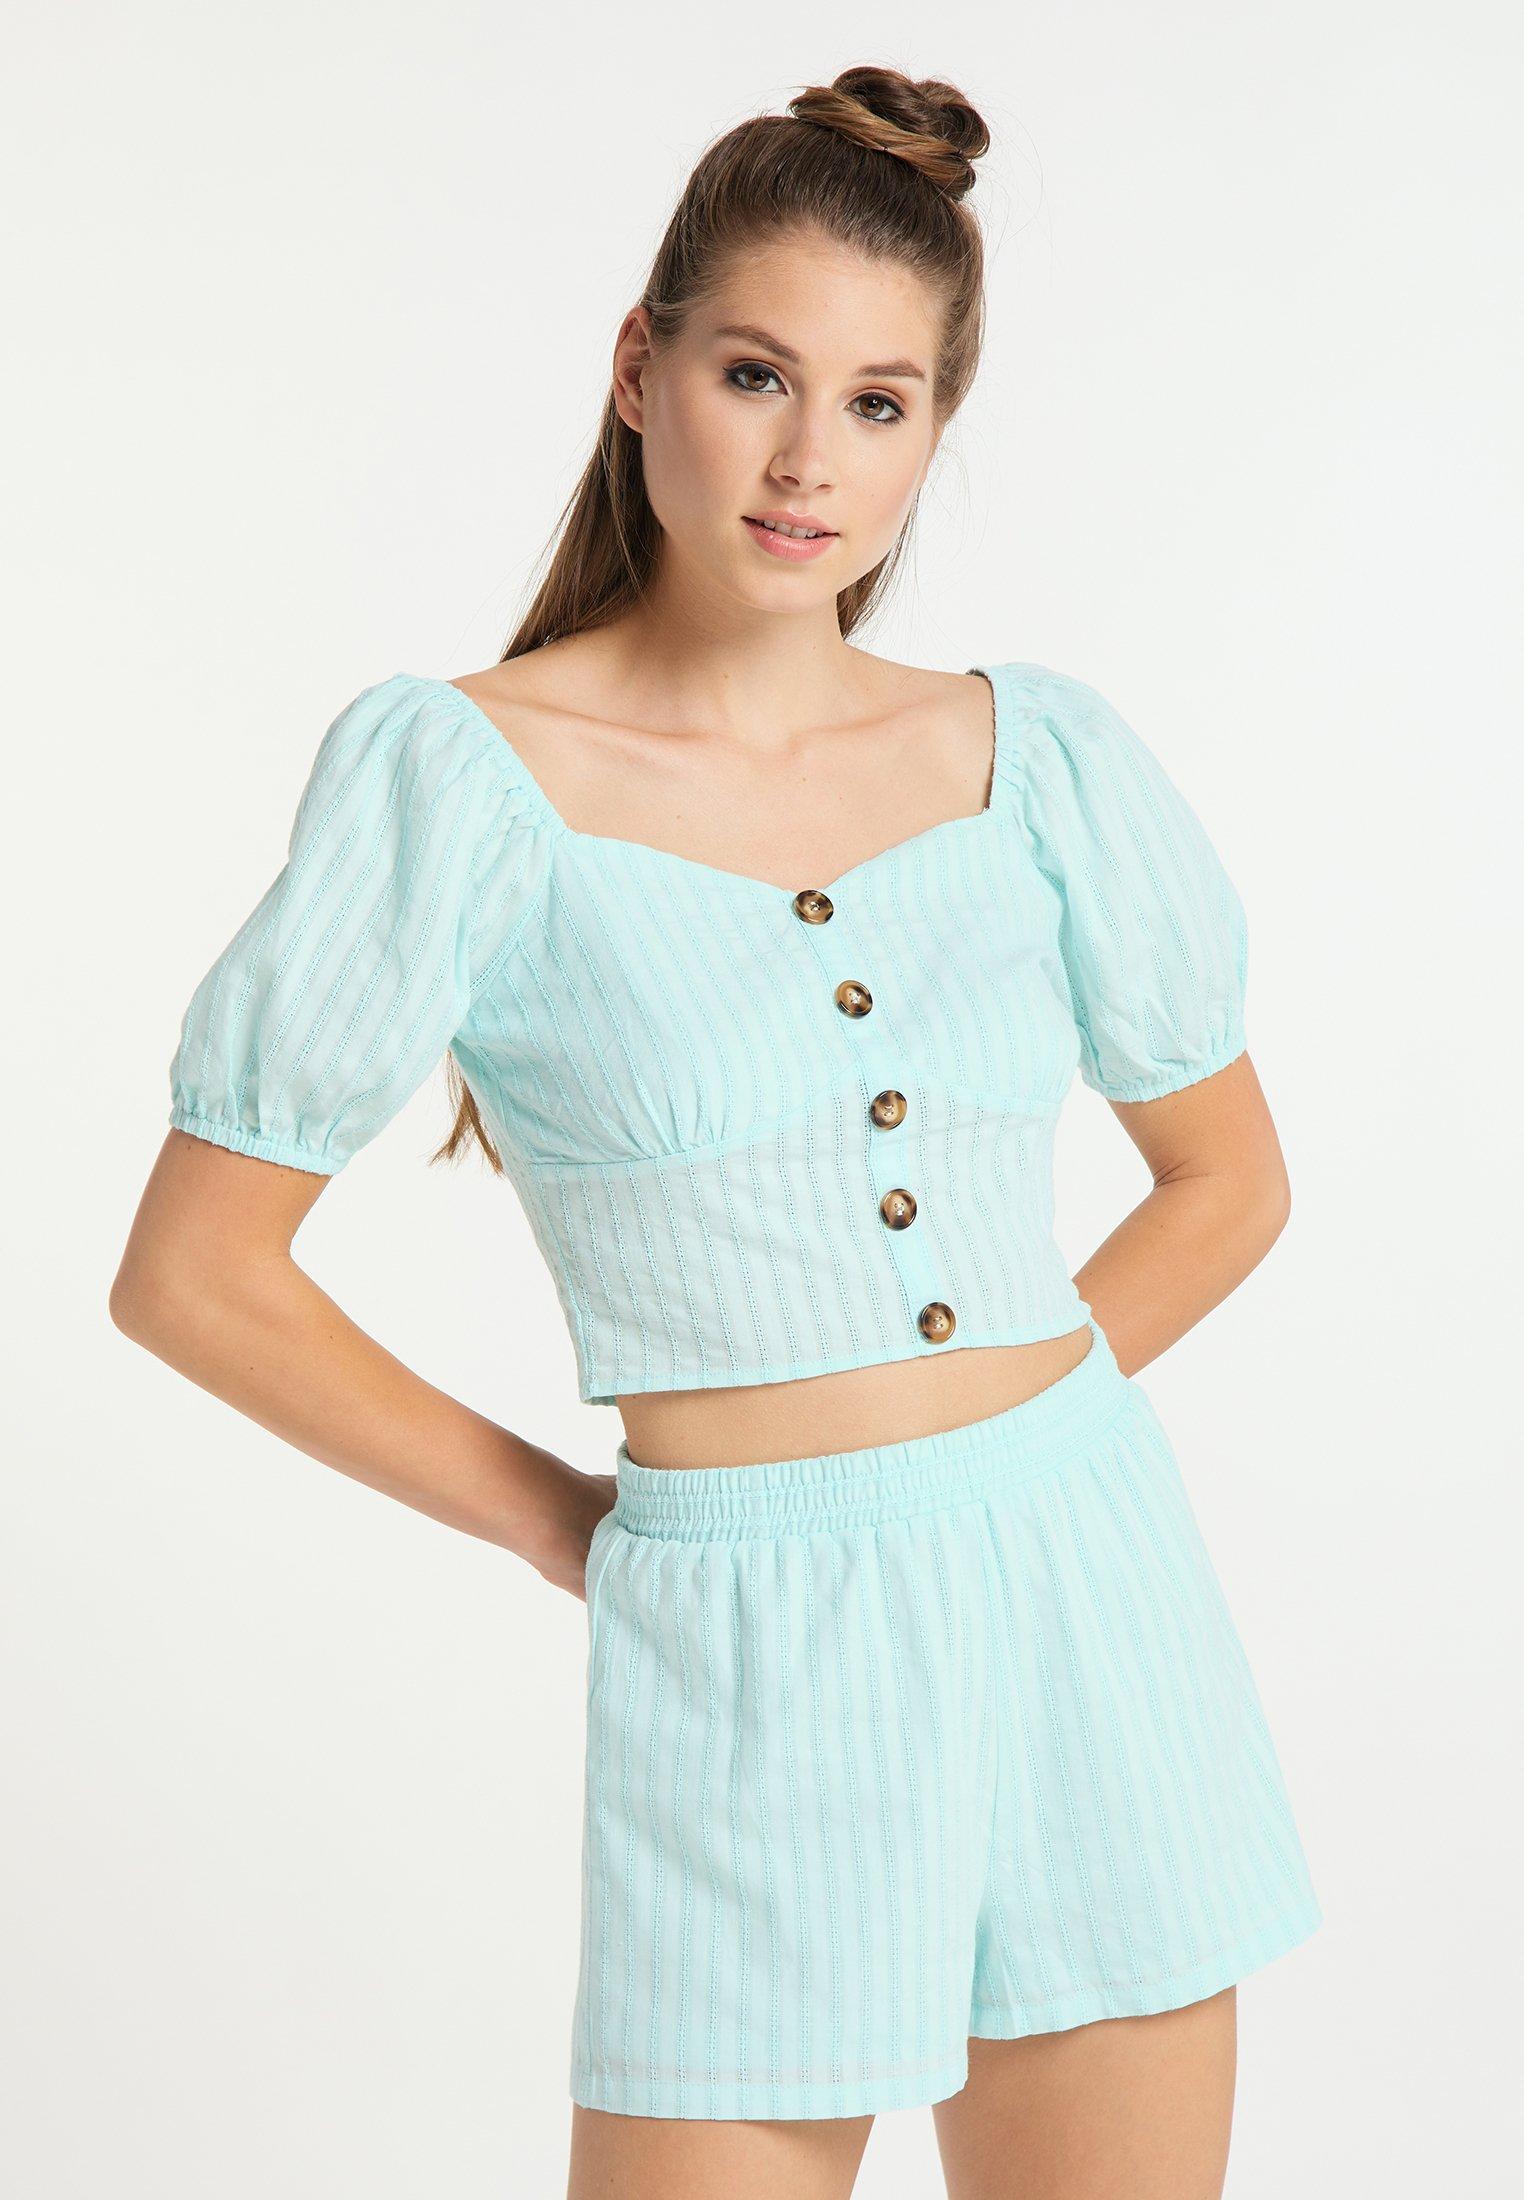 Discount Women's Clothing myMo Blouse hellblau WxTIWITzl